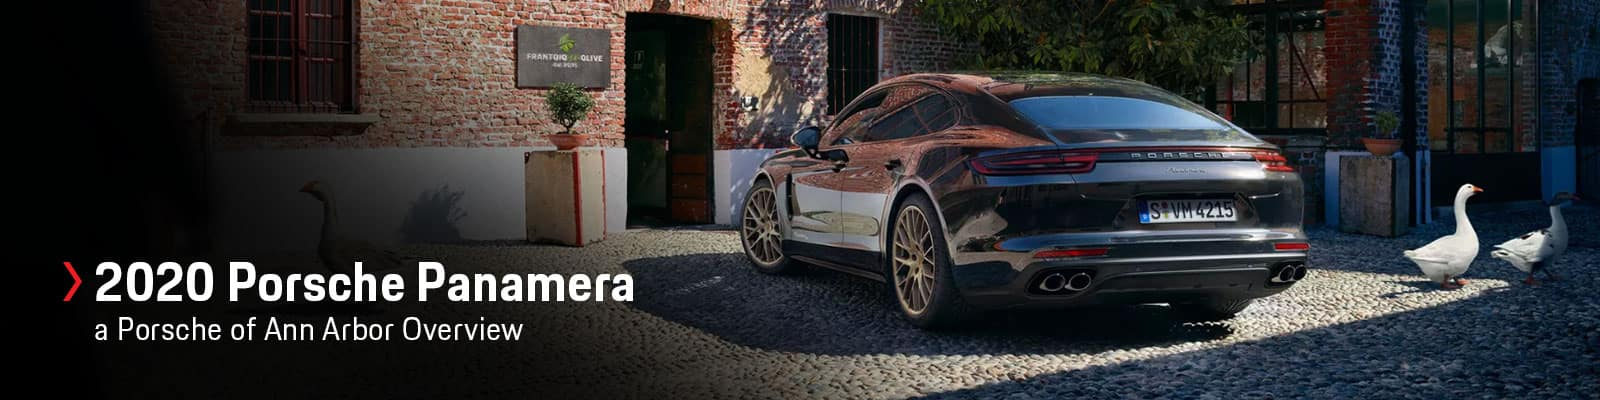 2020 Porsche Panamera Model Review with Prices, Photos, & Specs at Porsche of Ann Arbor